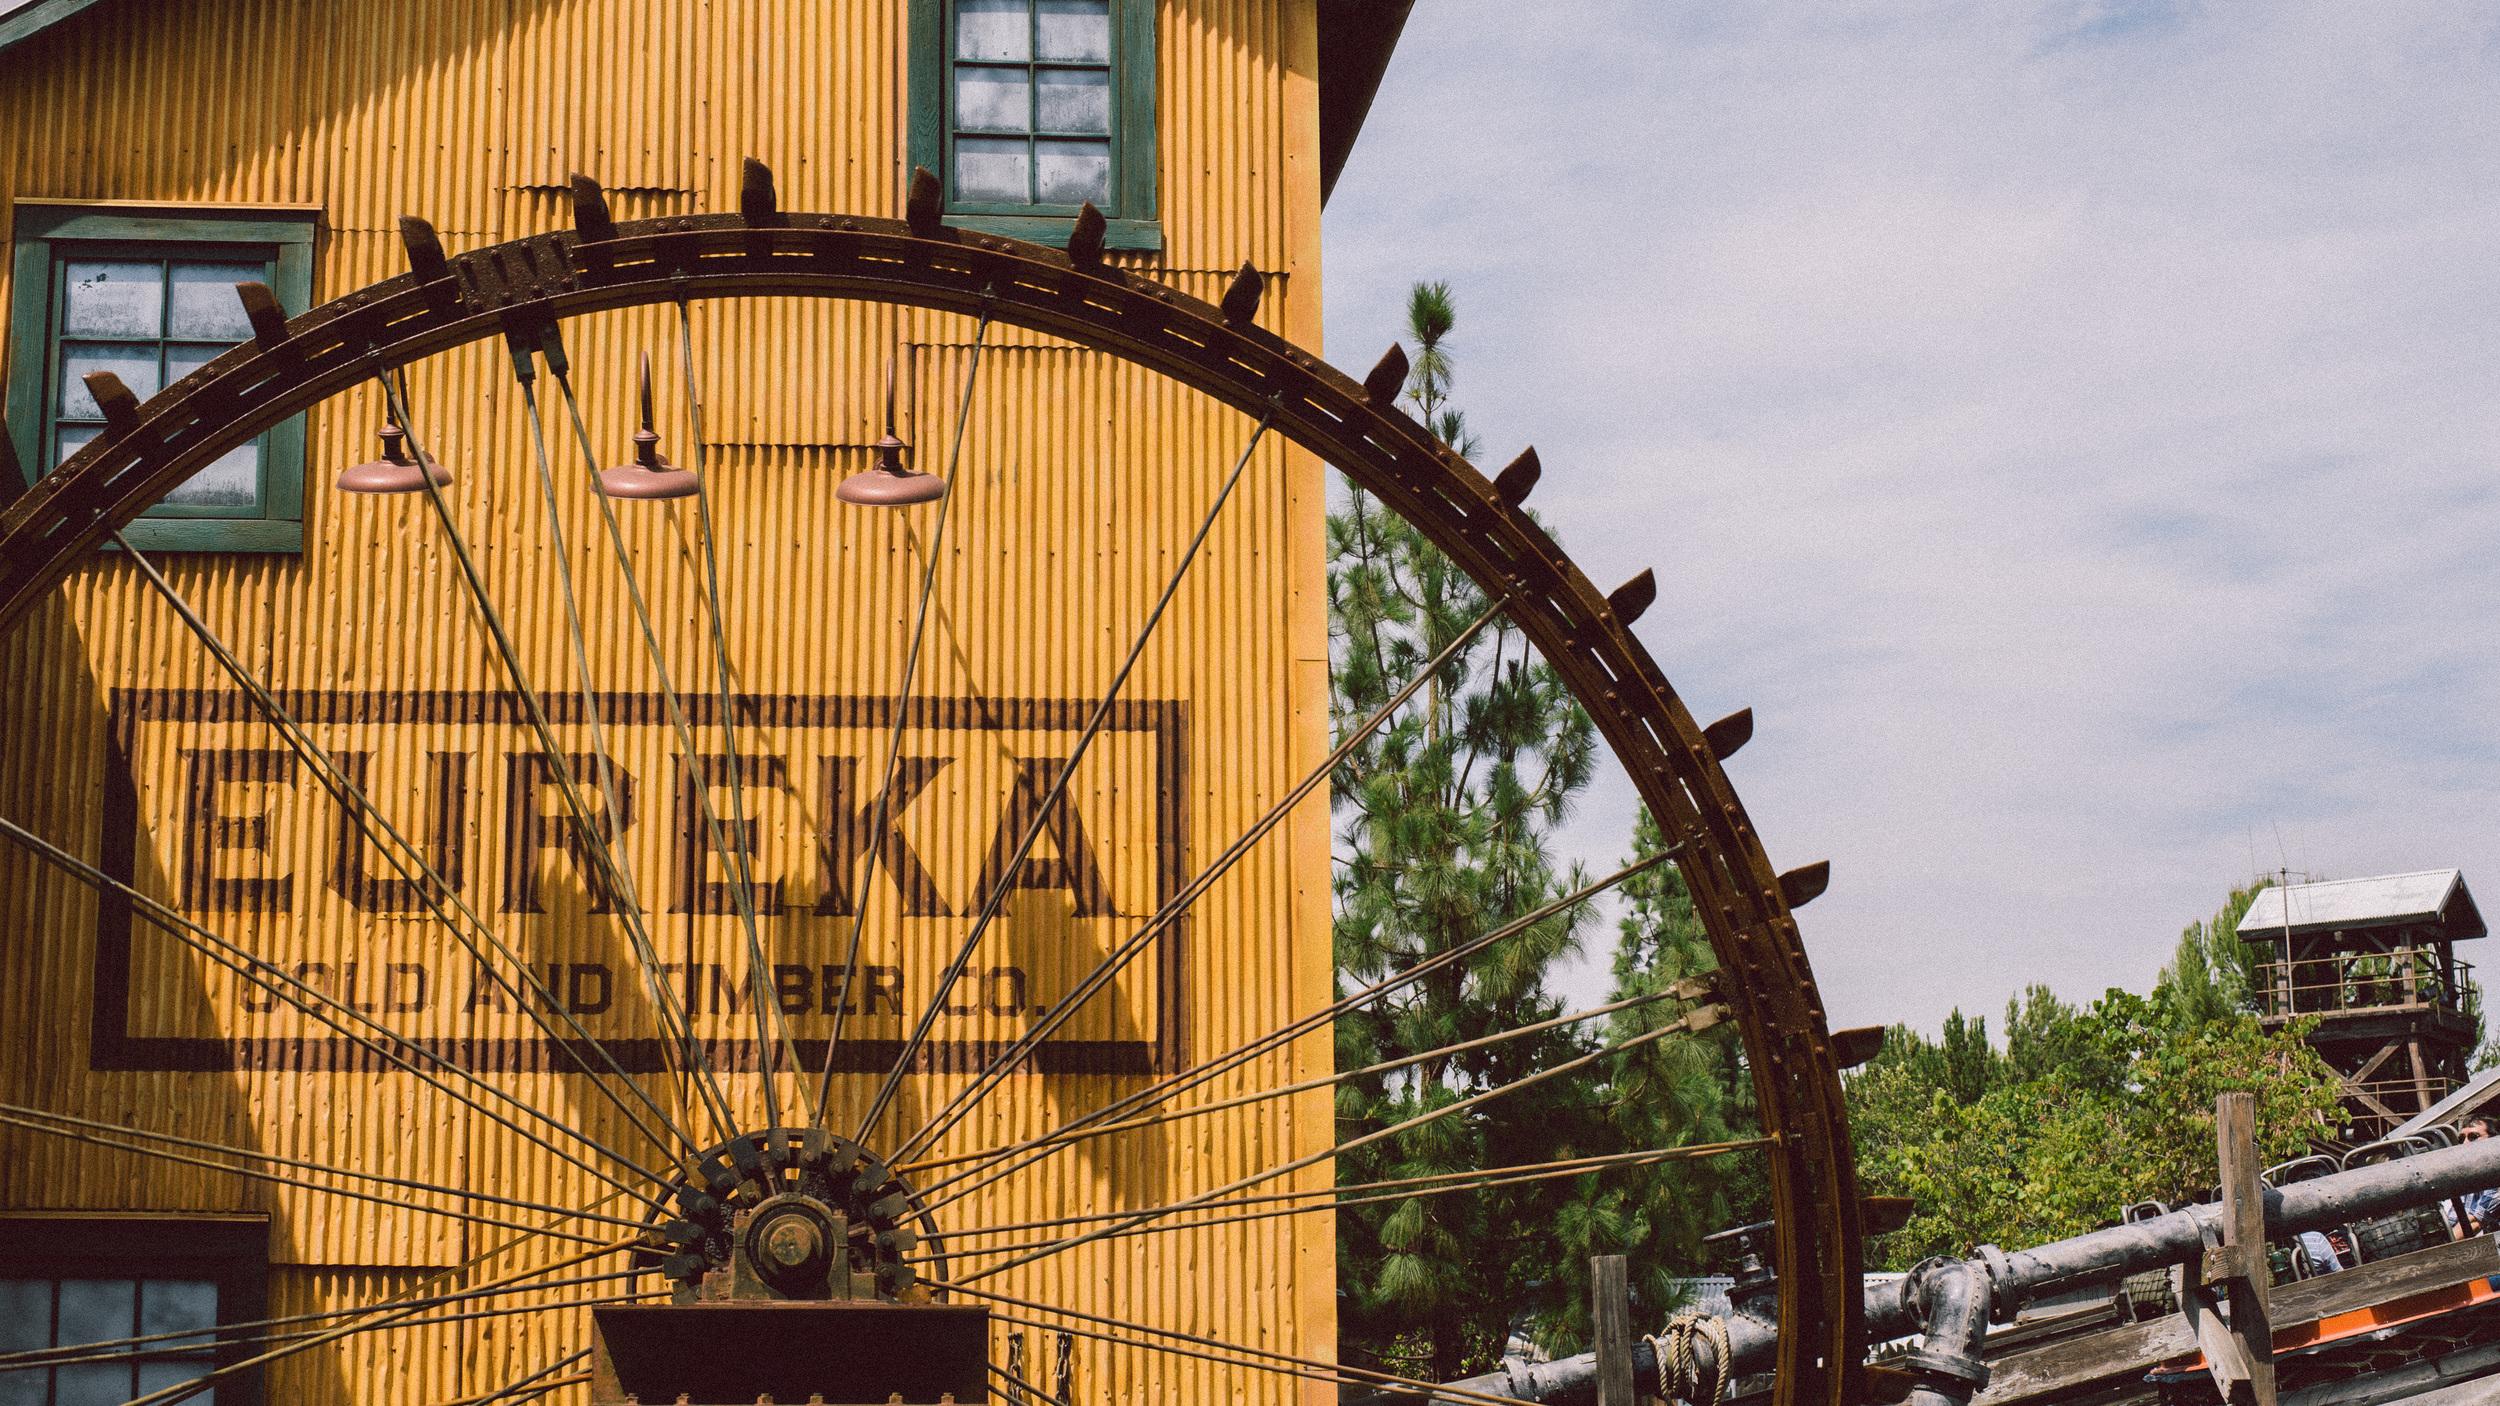 Eureka Gold and Timber Co.